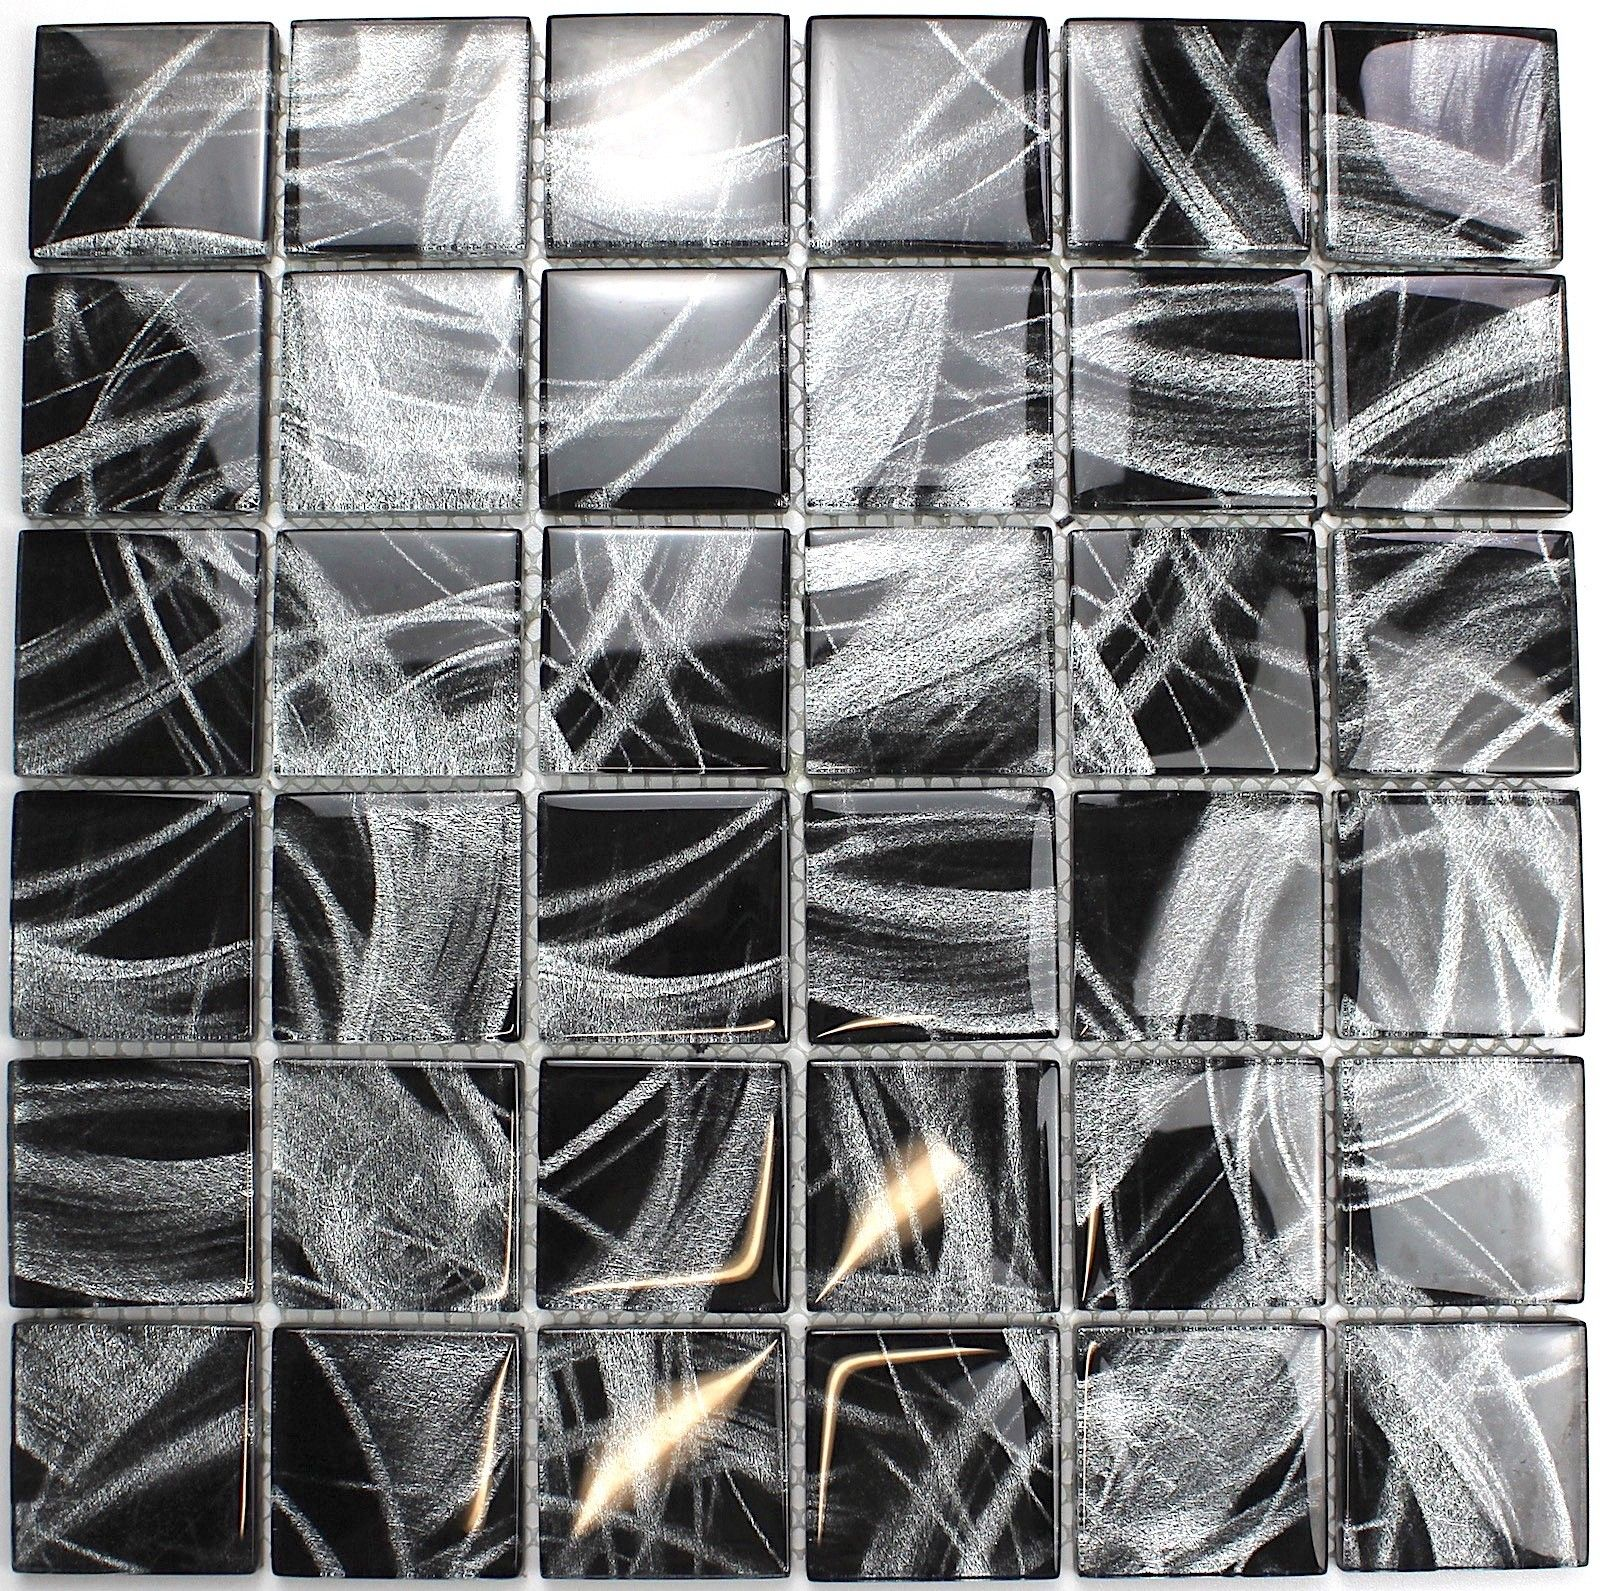 Fliesen mosaik fur wand glas mv uomo 13 92 l nge 32 cm - Farbe fur fliesen ...